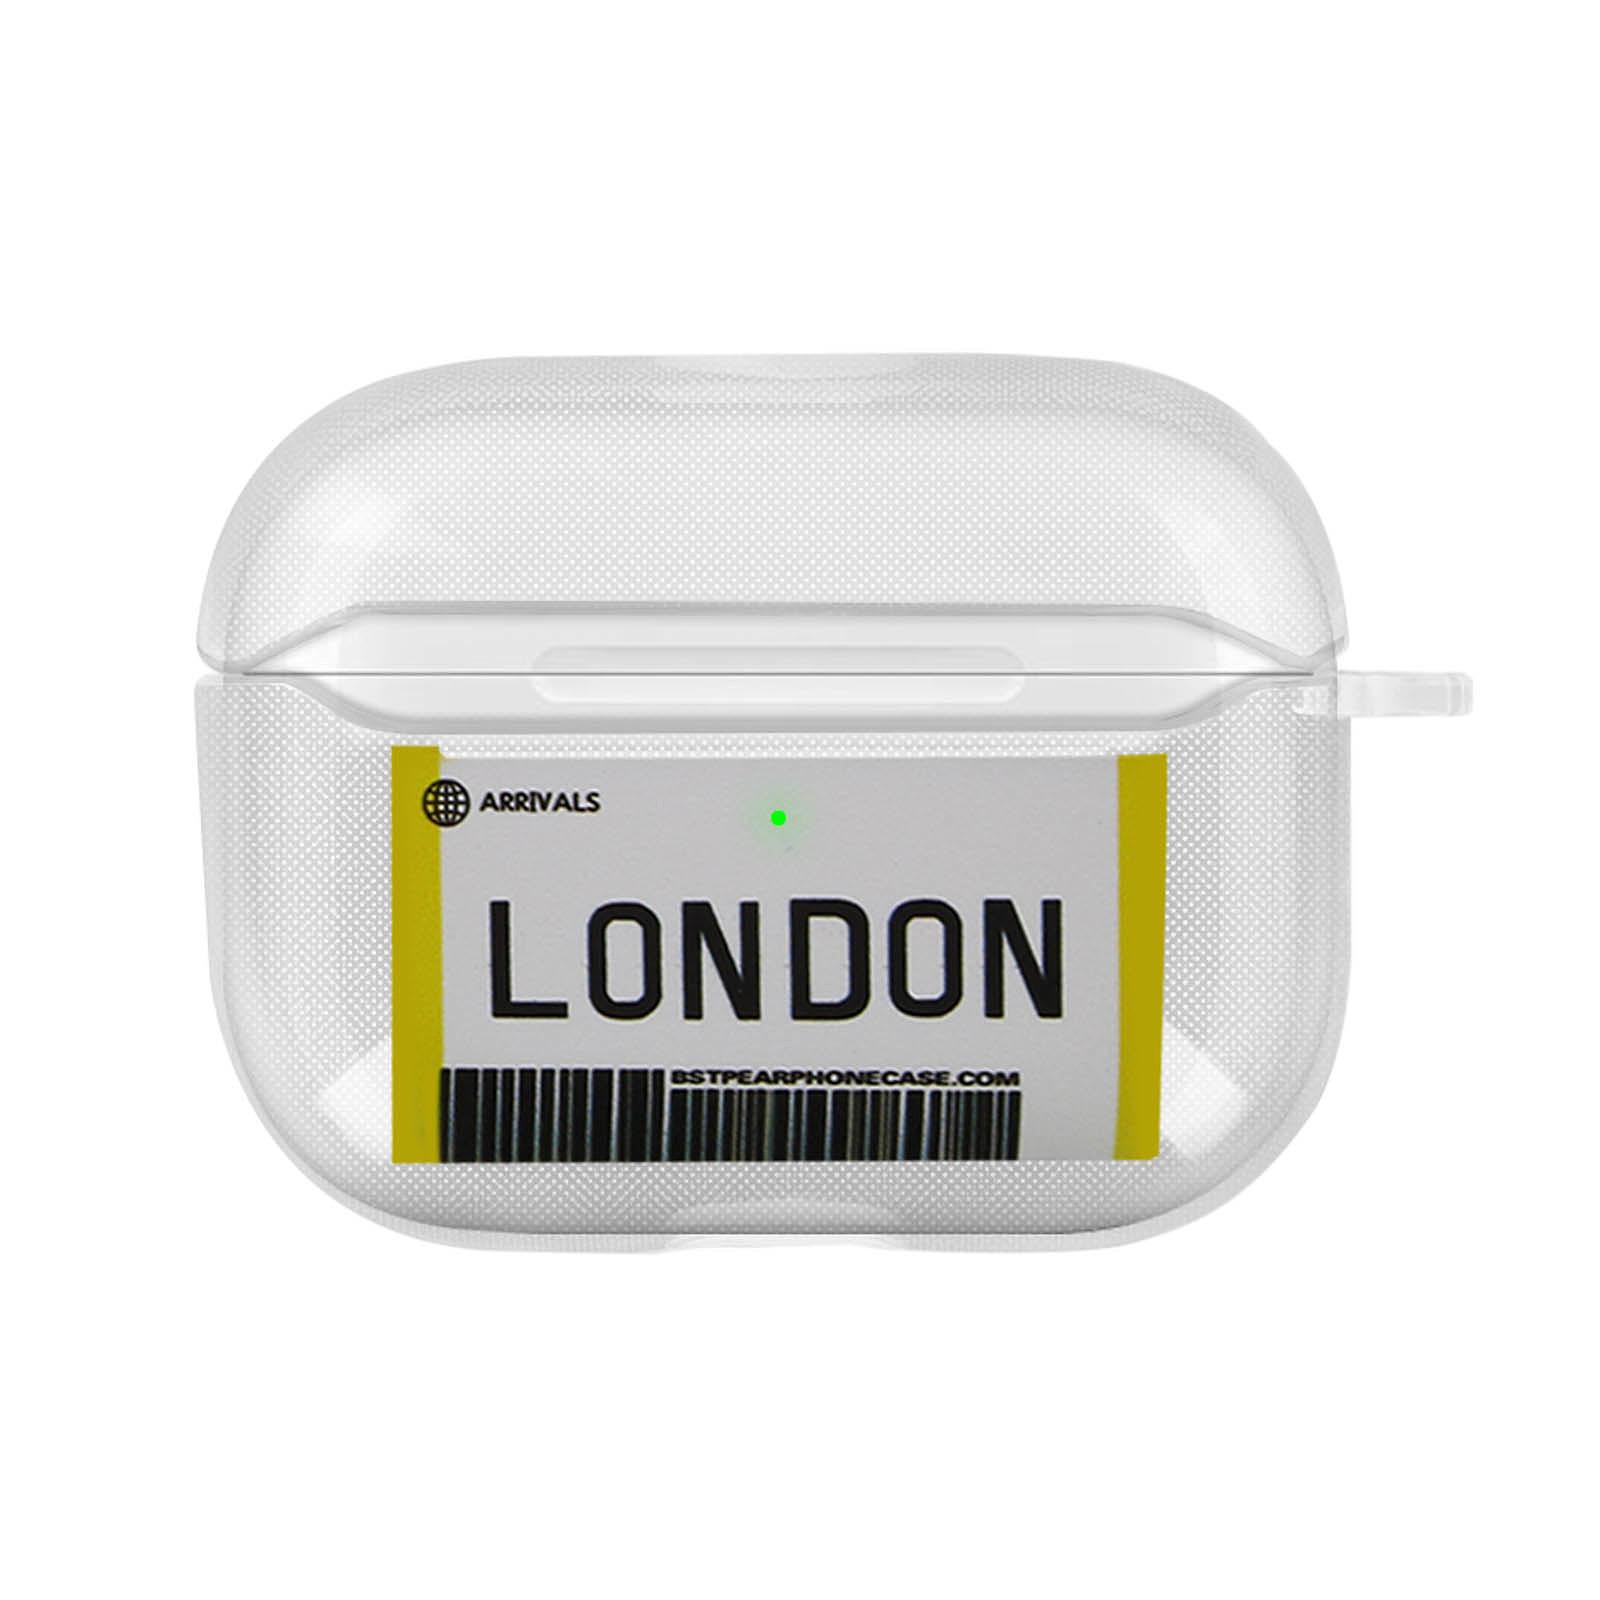 Avizar Coque London pour AirPods Pro